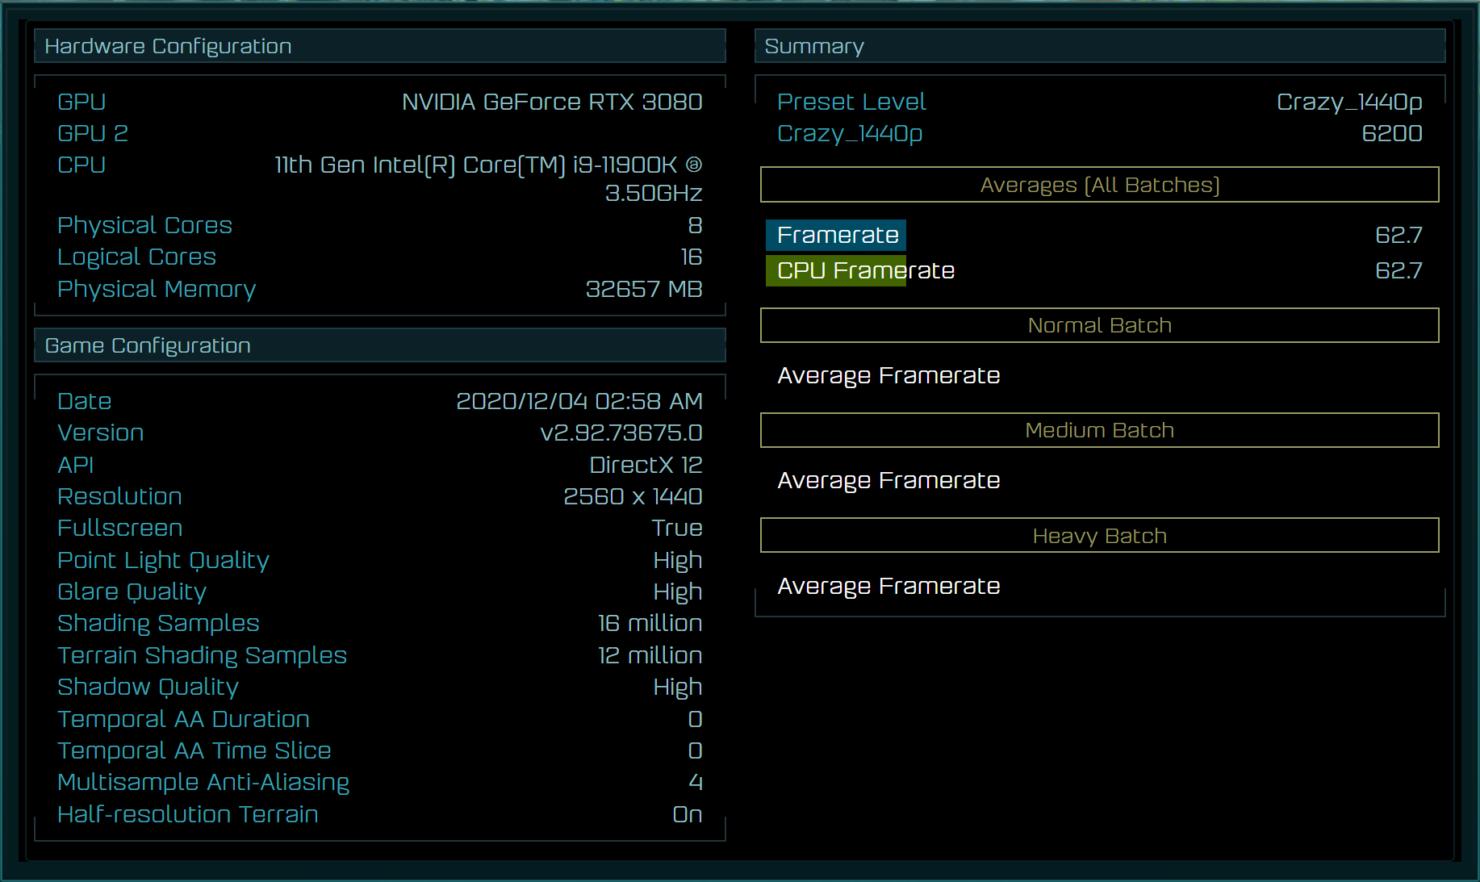 intel-core-i9-11900k-rocket-lake-8-core-desktop-cpu-performance-benchmark-leak-at-1440p